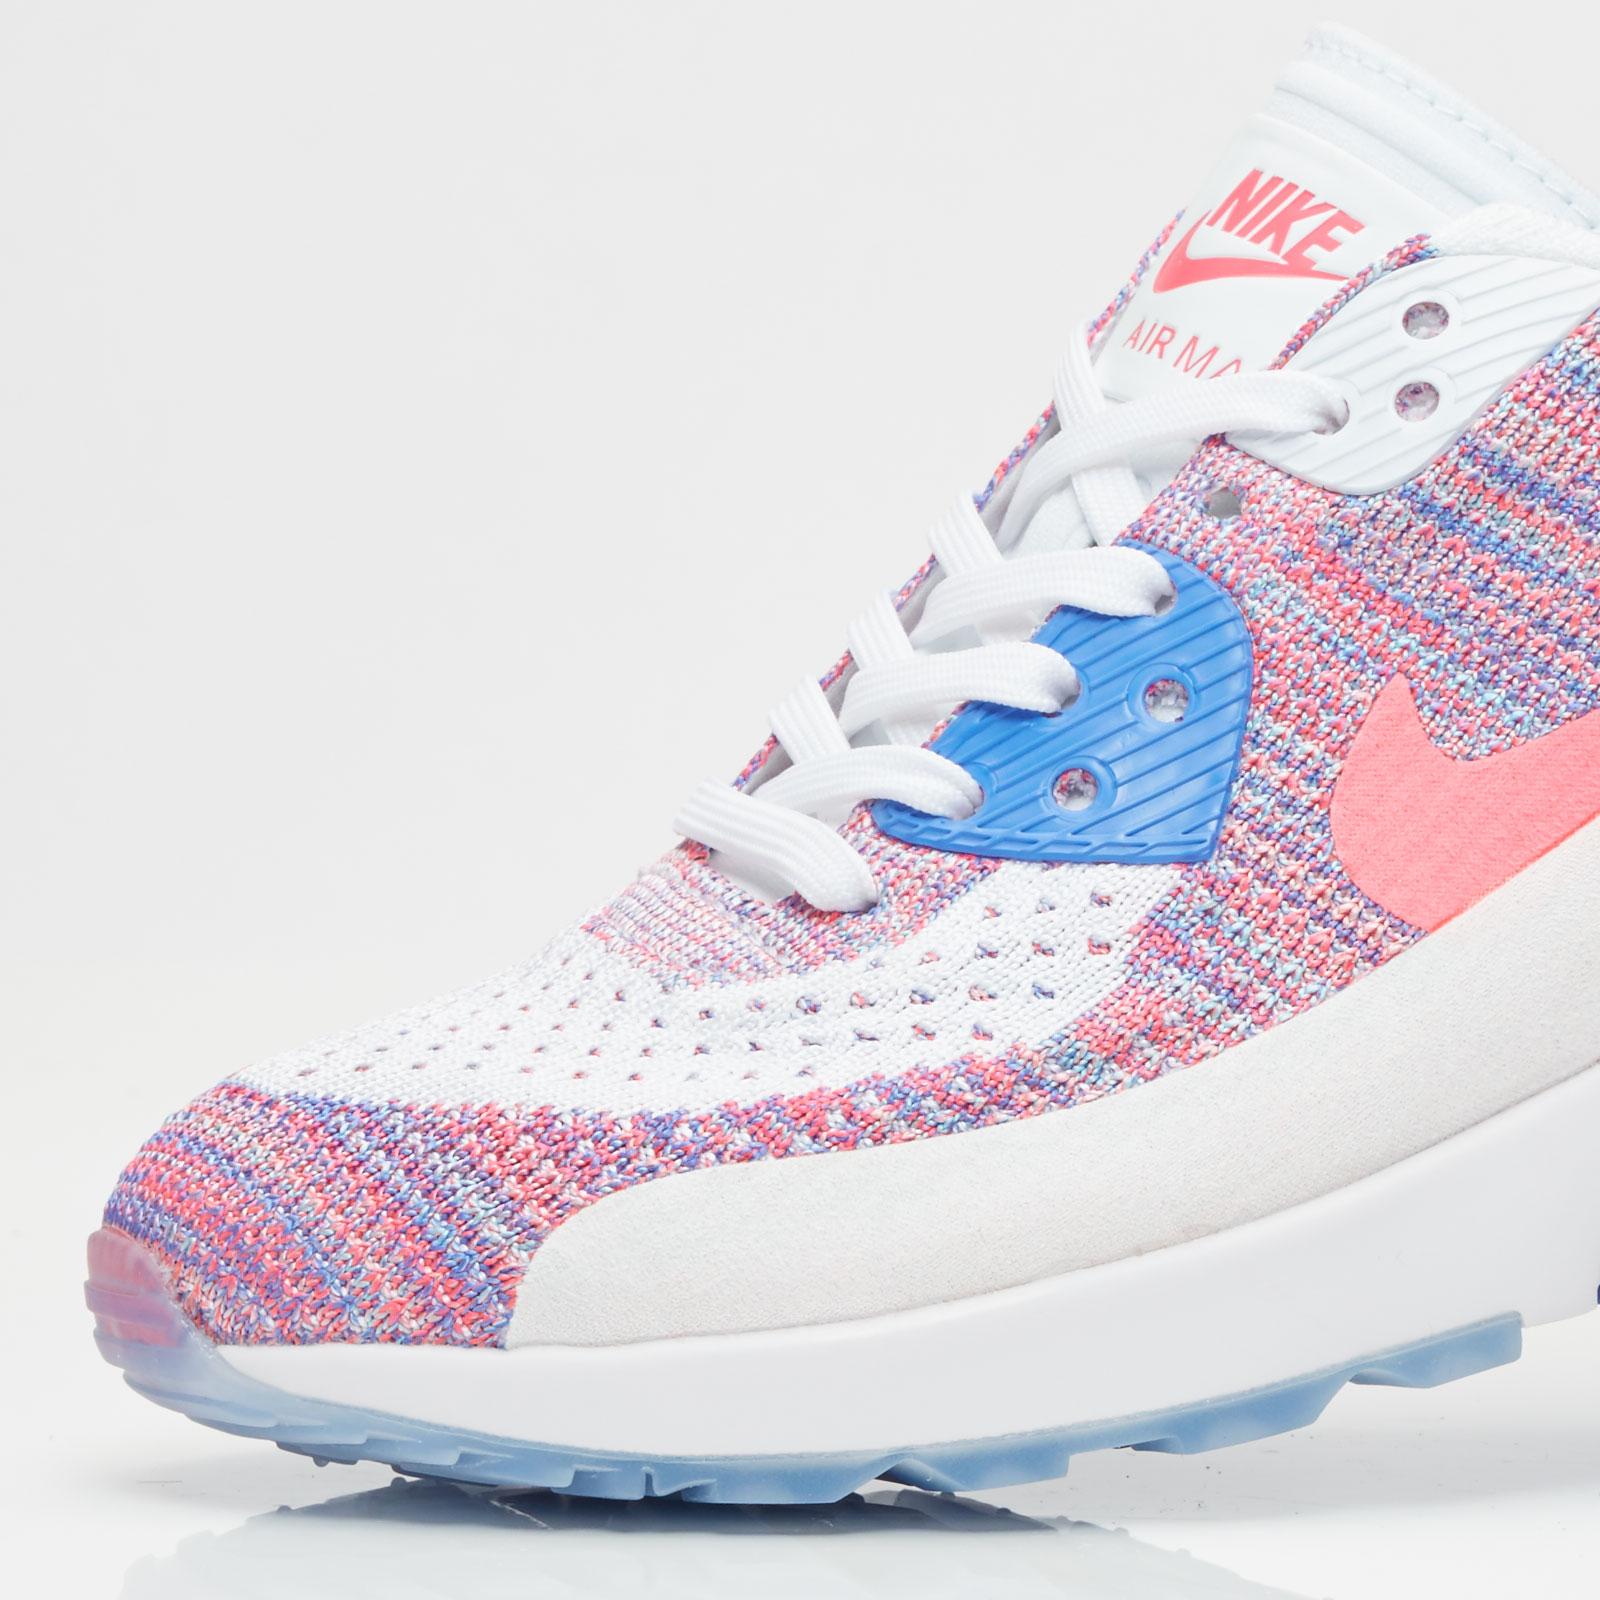 pretty nice e50fb e2c8d ... Nike Sportswear Wmns Air Max 90 Ultra 2.0 Flyknit ...